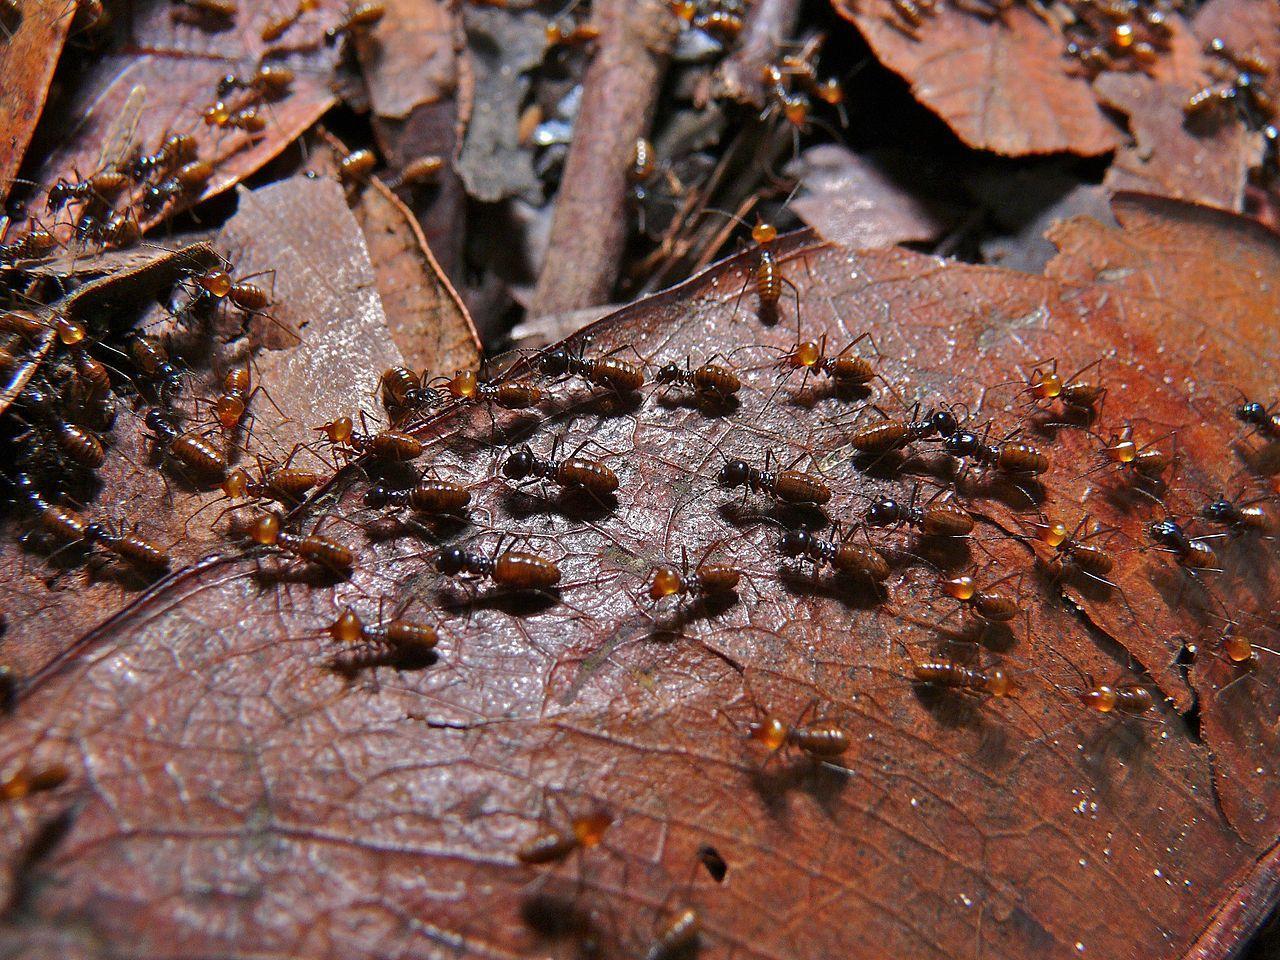 https://upload.wikimedia.org/wikipedia/commons/thumb/8/84/Termites_%28Nasutitermes_sp.%29_%288439859723%29.jpg/1280px-Termites_%28Nasutitermes_sp.%29_%288439859723%29.jpg